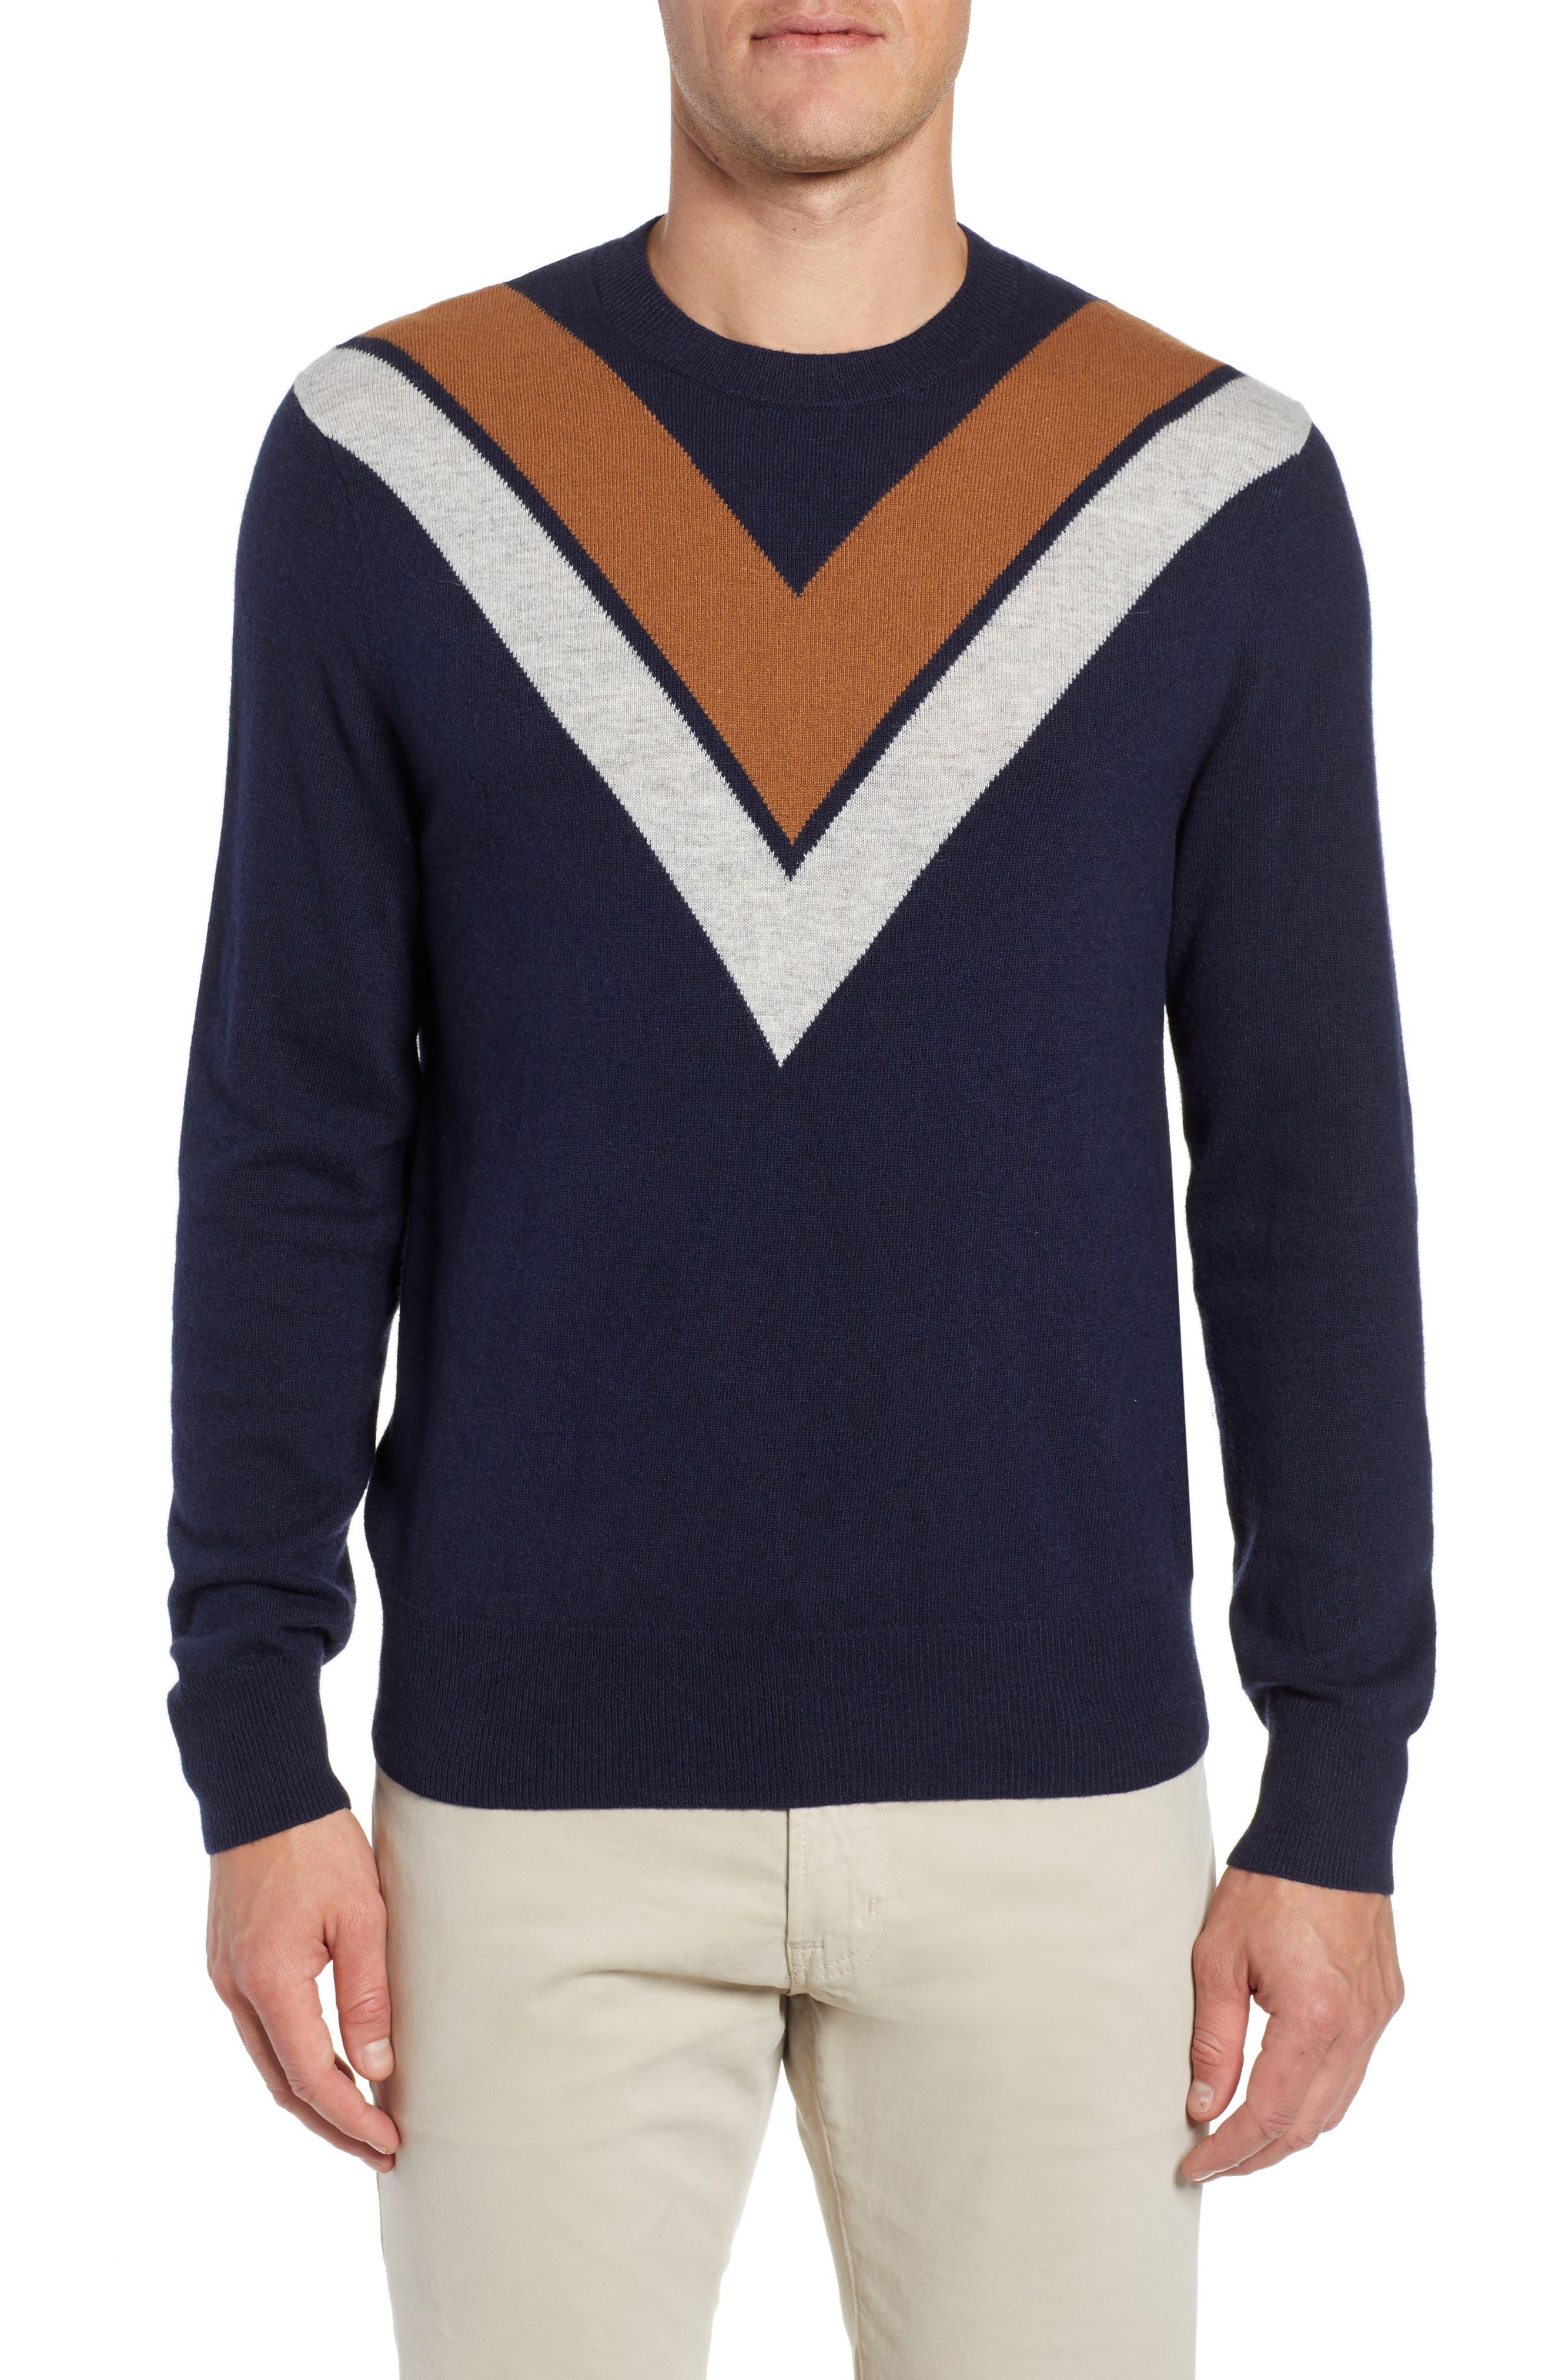 1960s Men's Clothing, 70s Men's Fashion Mens Bonobos Minton V Crewneck Sweater Size XX-Large - Blue $85.76 AT vintagedancer.com